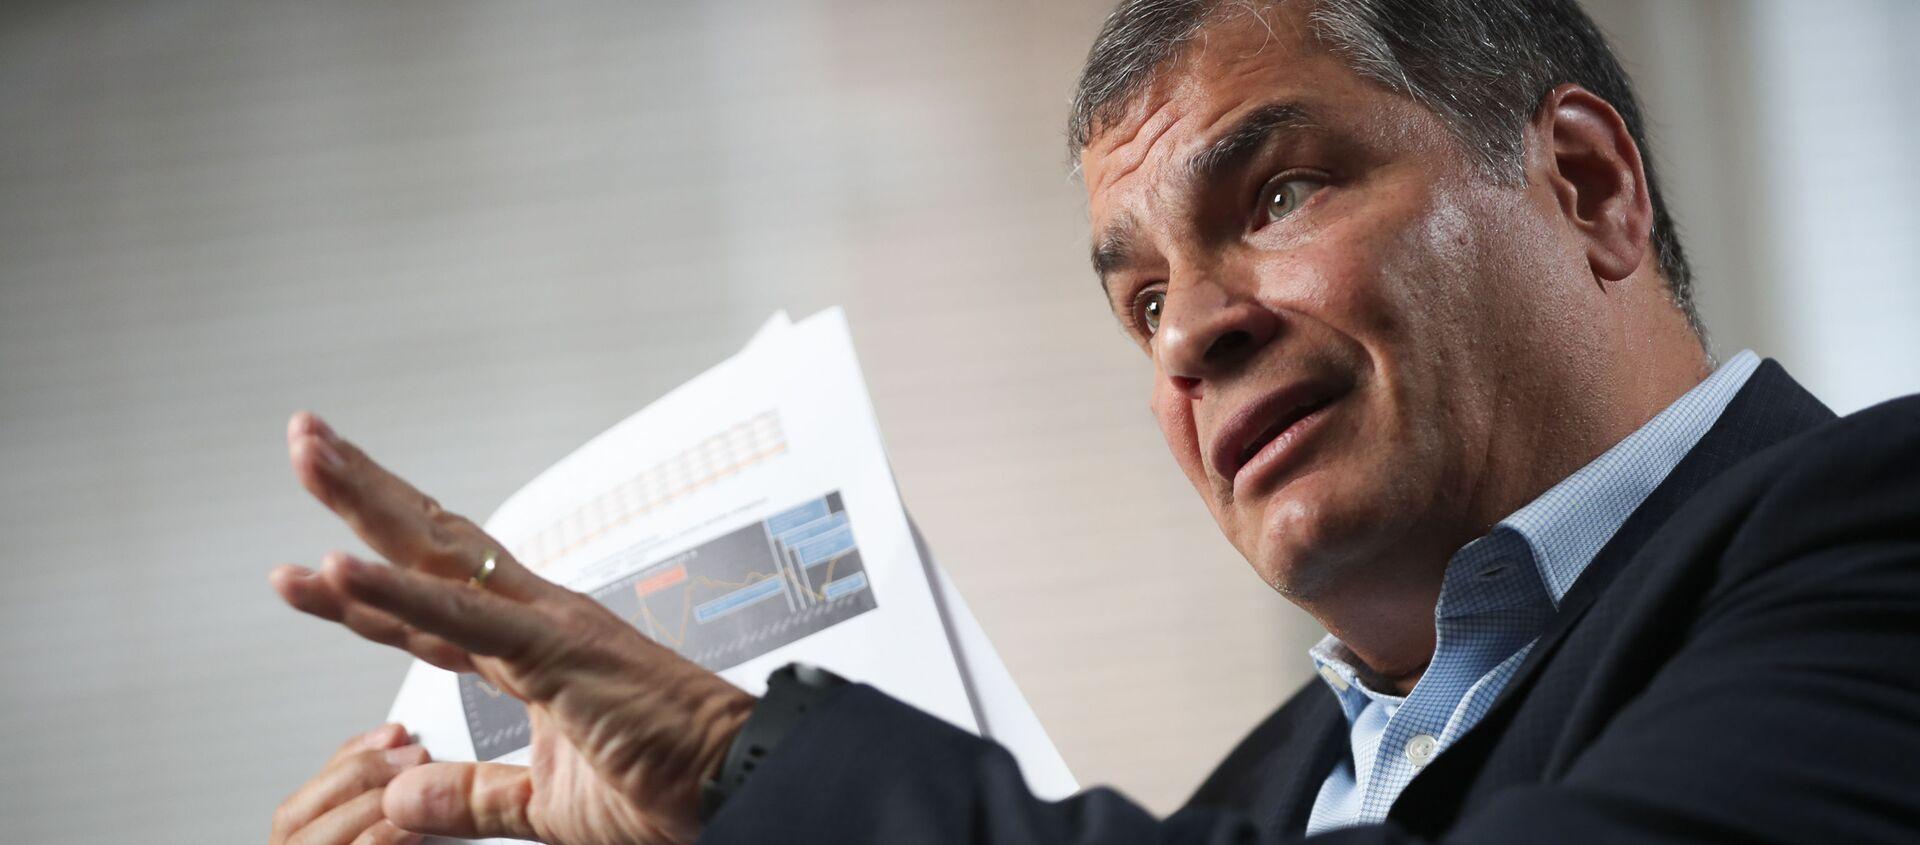 Rafael Correa, expresidente de Ecuador - Sputnik Mundo, 1920, 29.01.2021